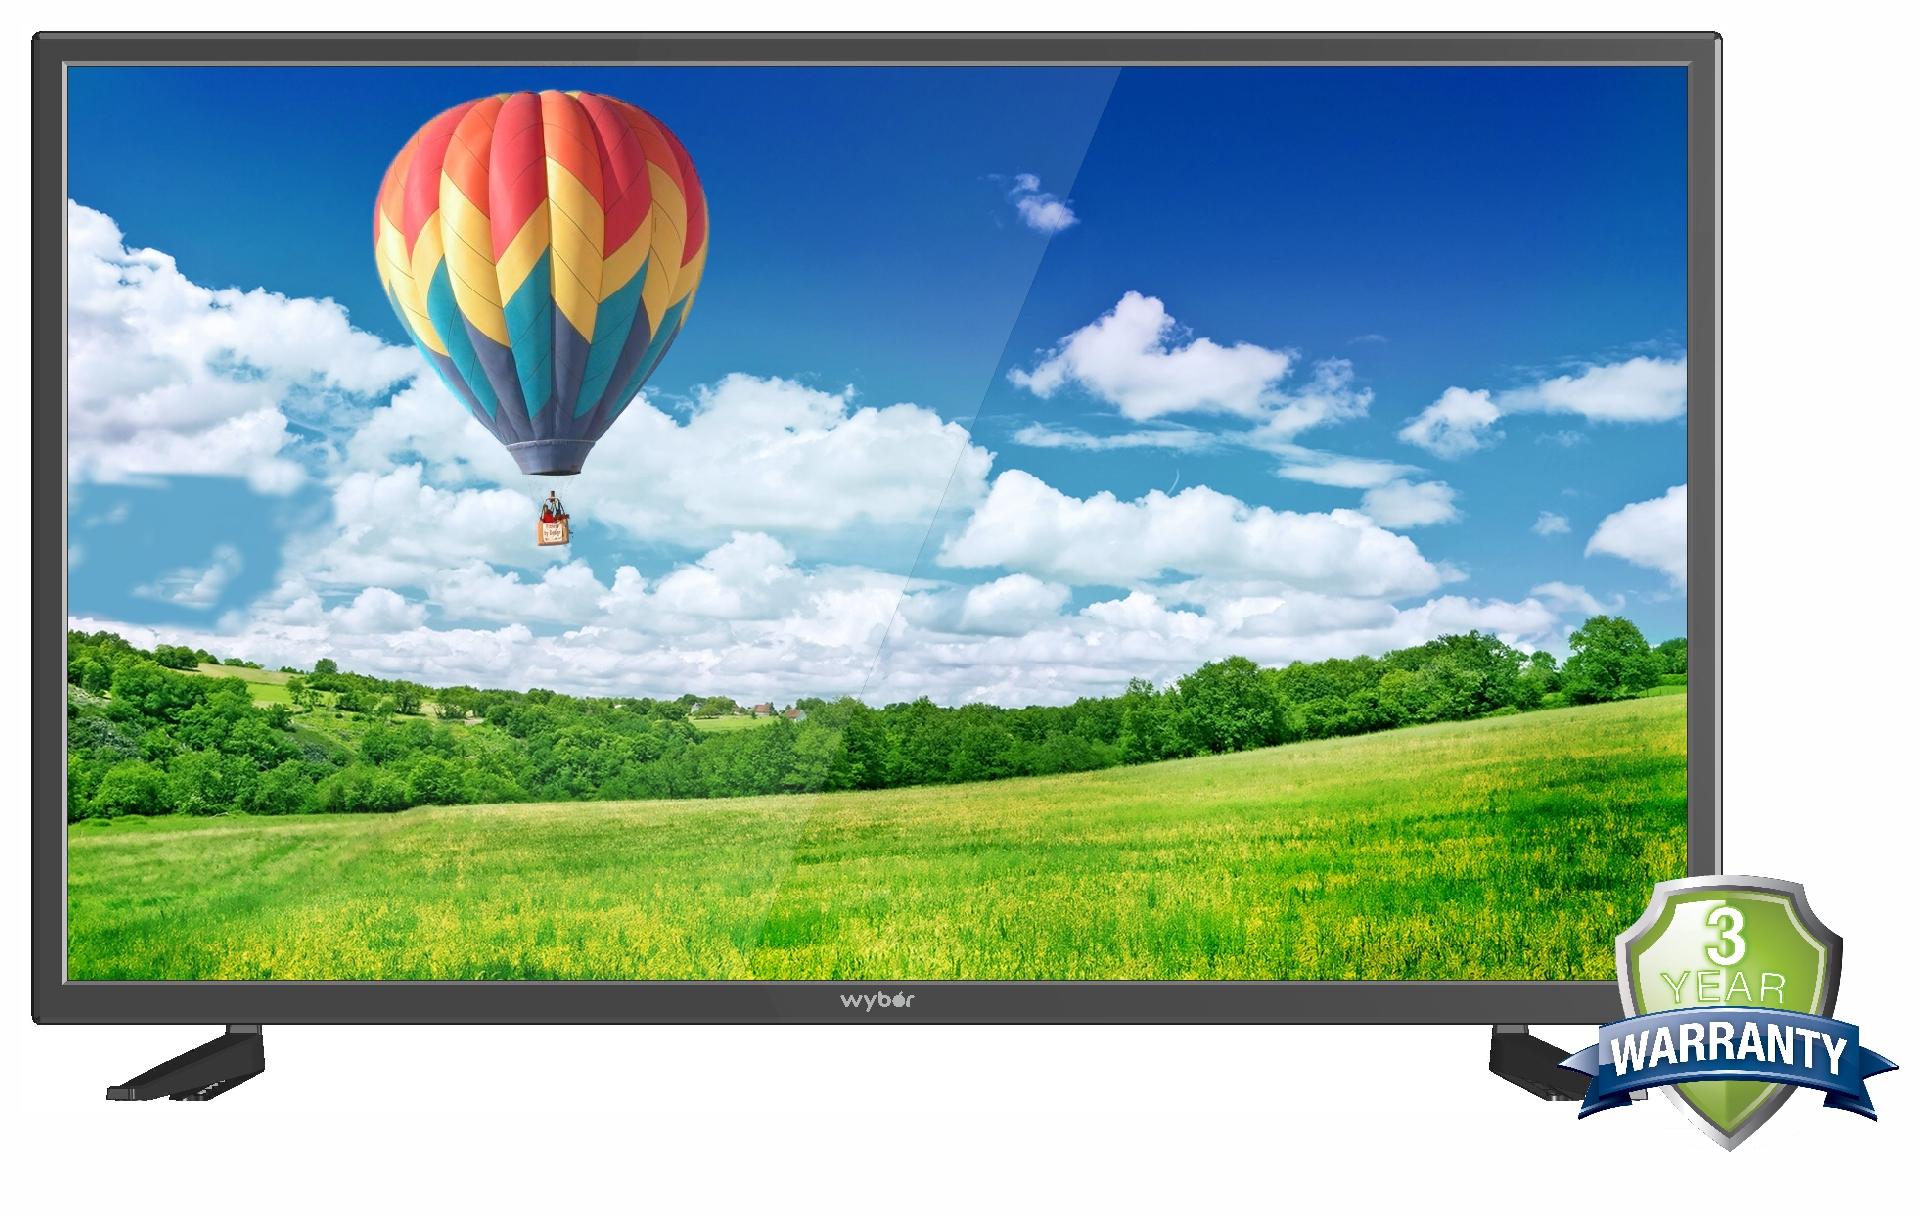 WYBOR 40MS16 40 Inches Full HD LED TV